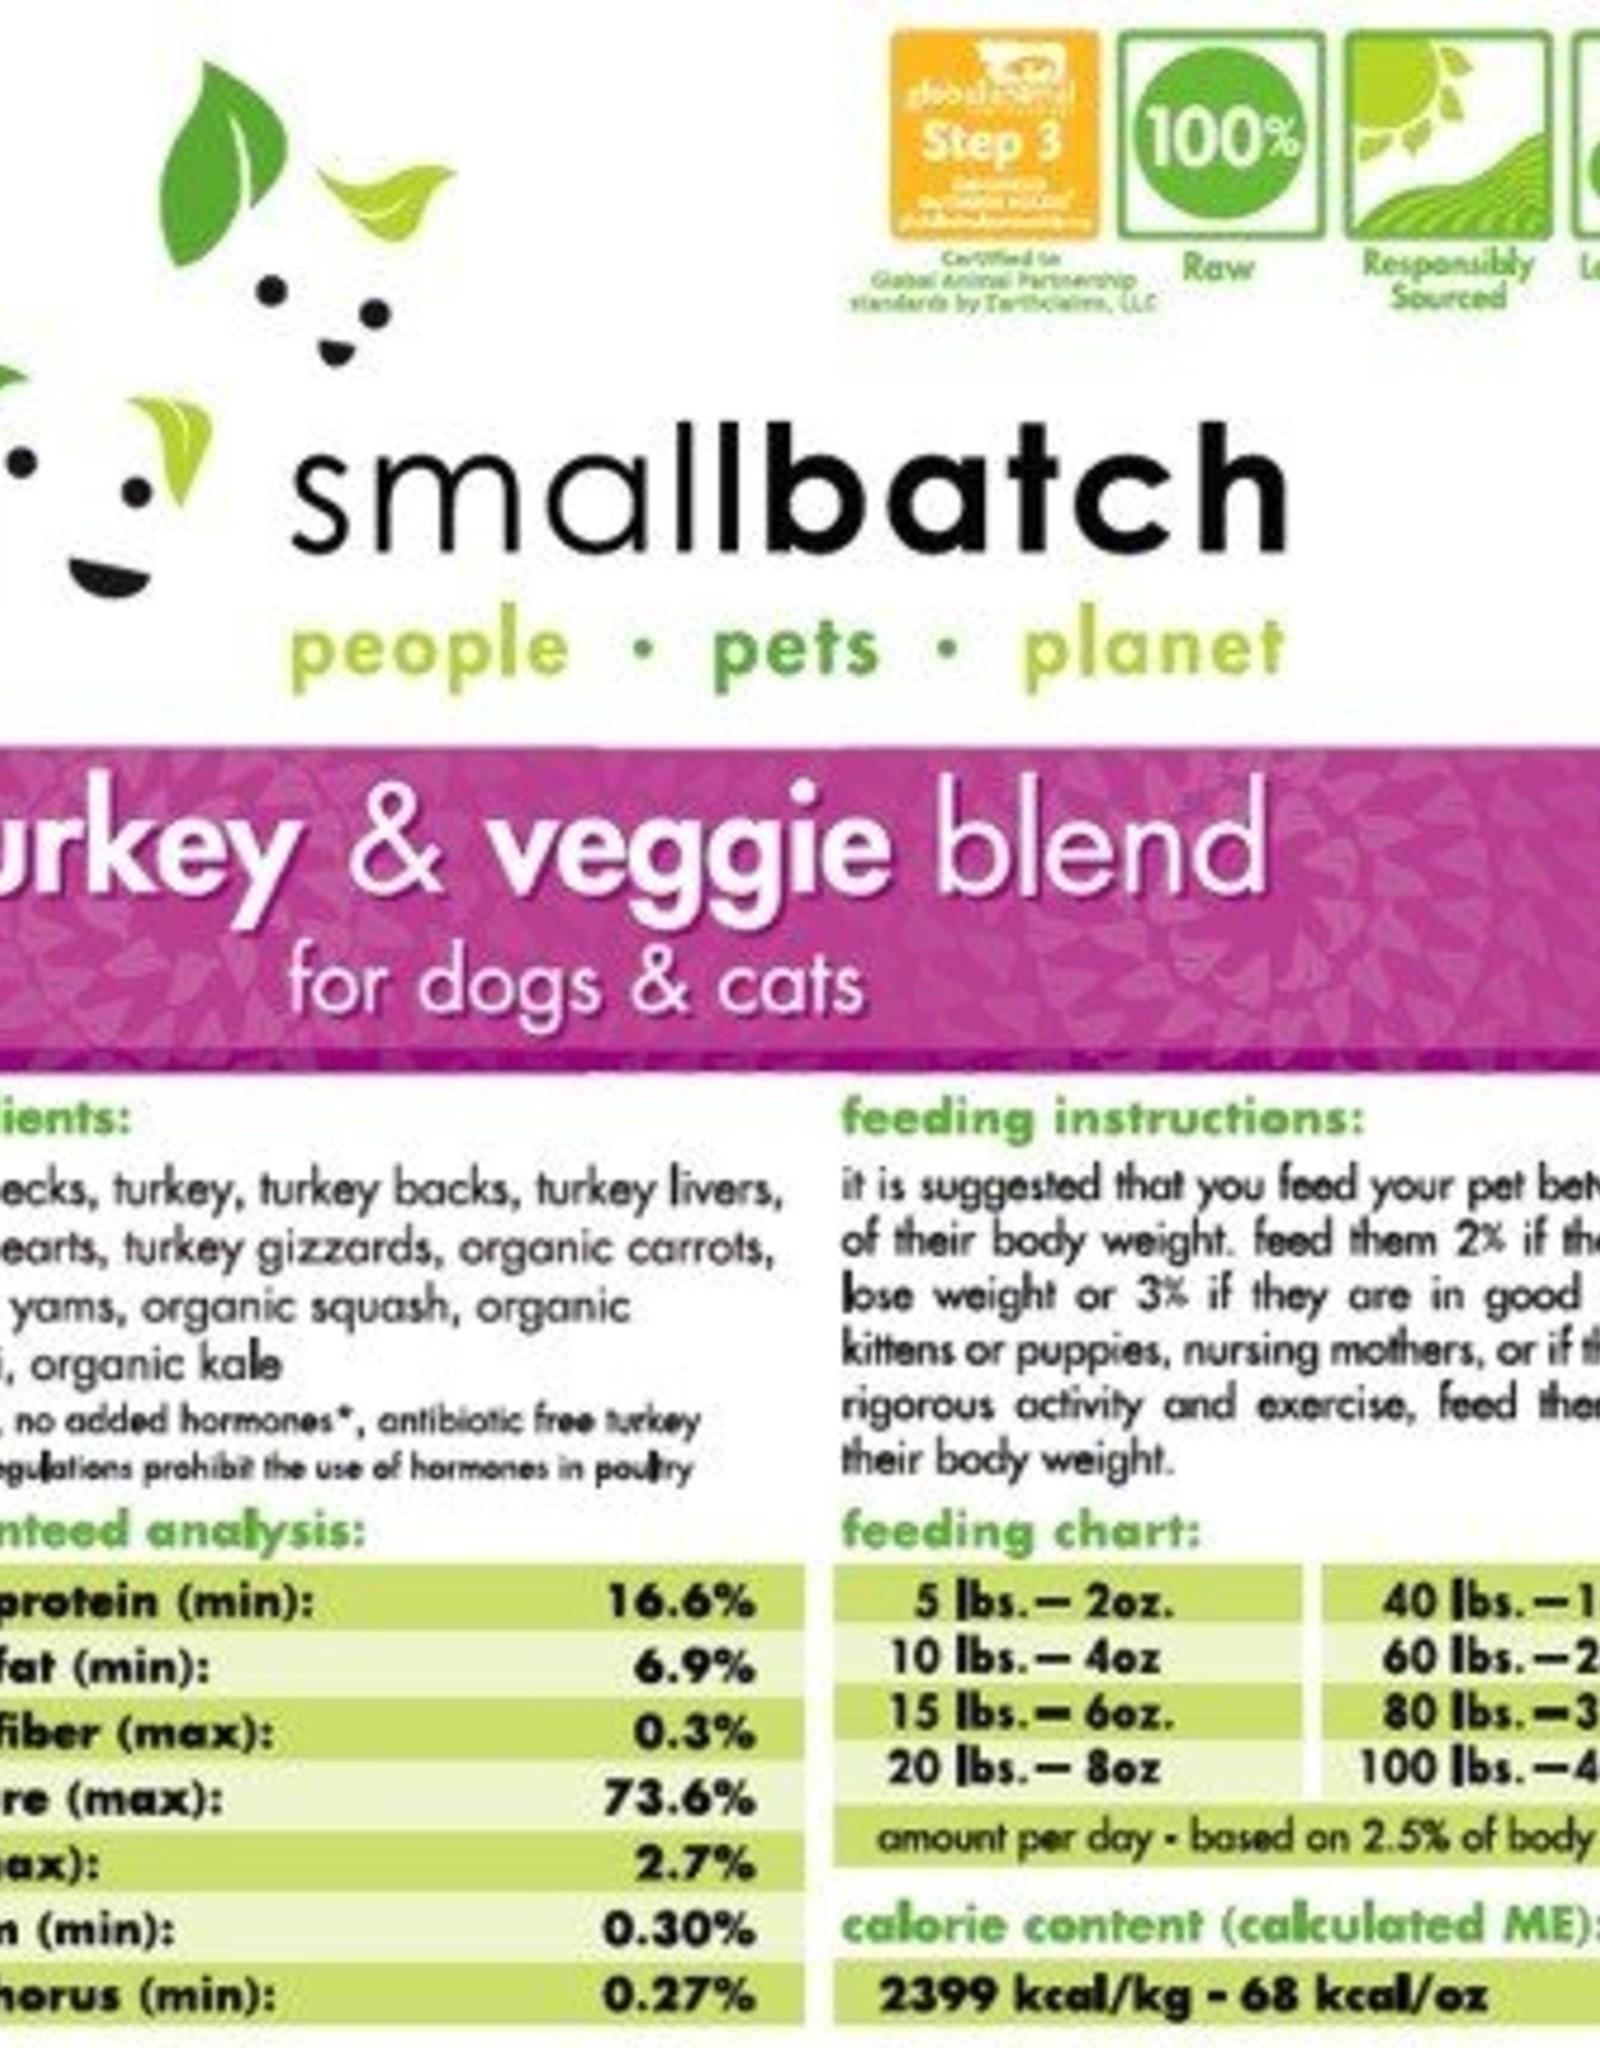 Smallbatch Smallbatch Turkey Vegetable Blend 2lb